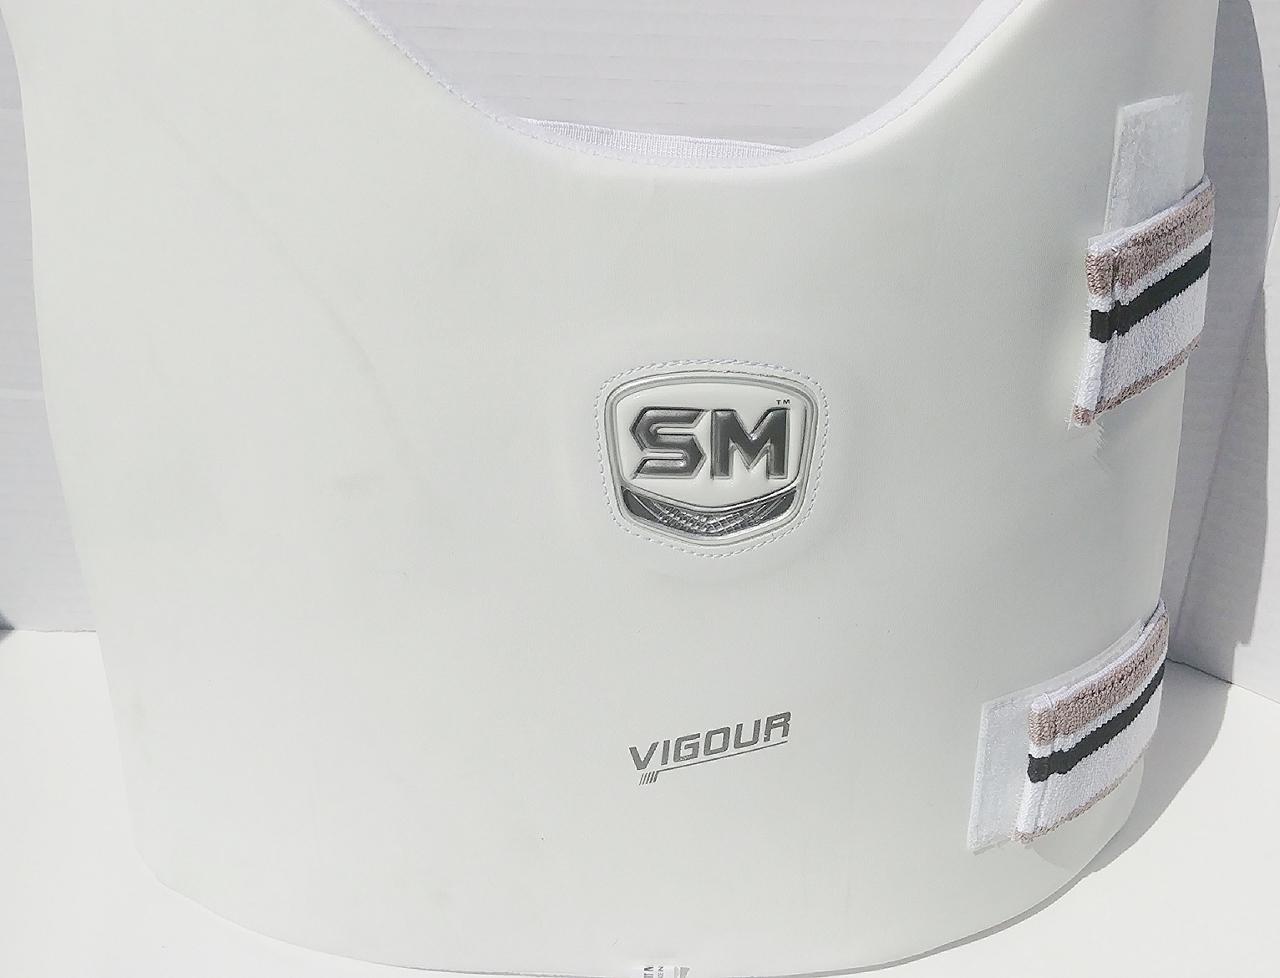 Picture of SM CRICKET CHEST GUARD VIGOUR